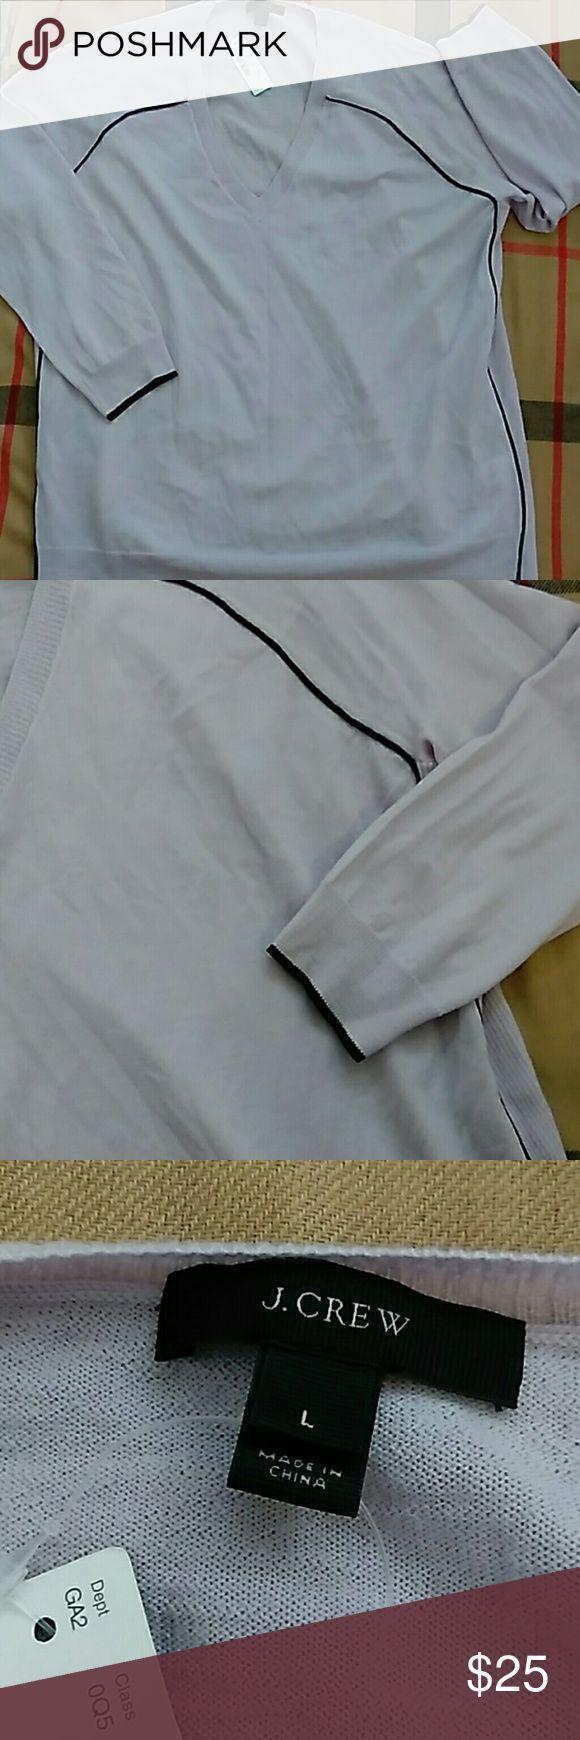 J CREW CARNIGAN PURPLE BLK TRIM SIZE L BRAND NEW LIGHT PURPLE BLK DETAILS V NECK LINE 100% MERINO WOOL VERY PRETTY FOR FALL bust 54 length 29 waist 54 sleeves 28 J. Crew Sweaters Cardigans